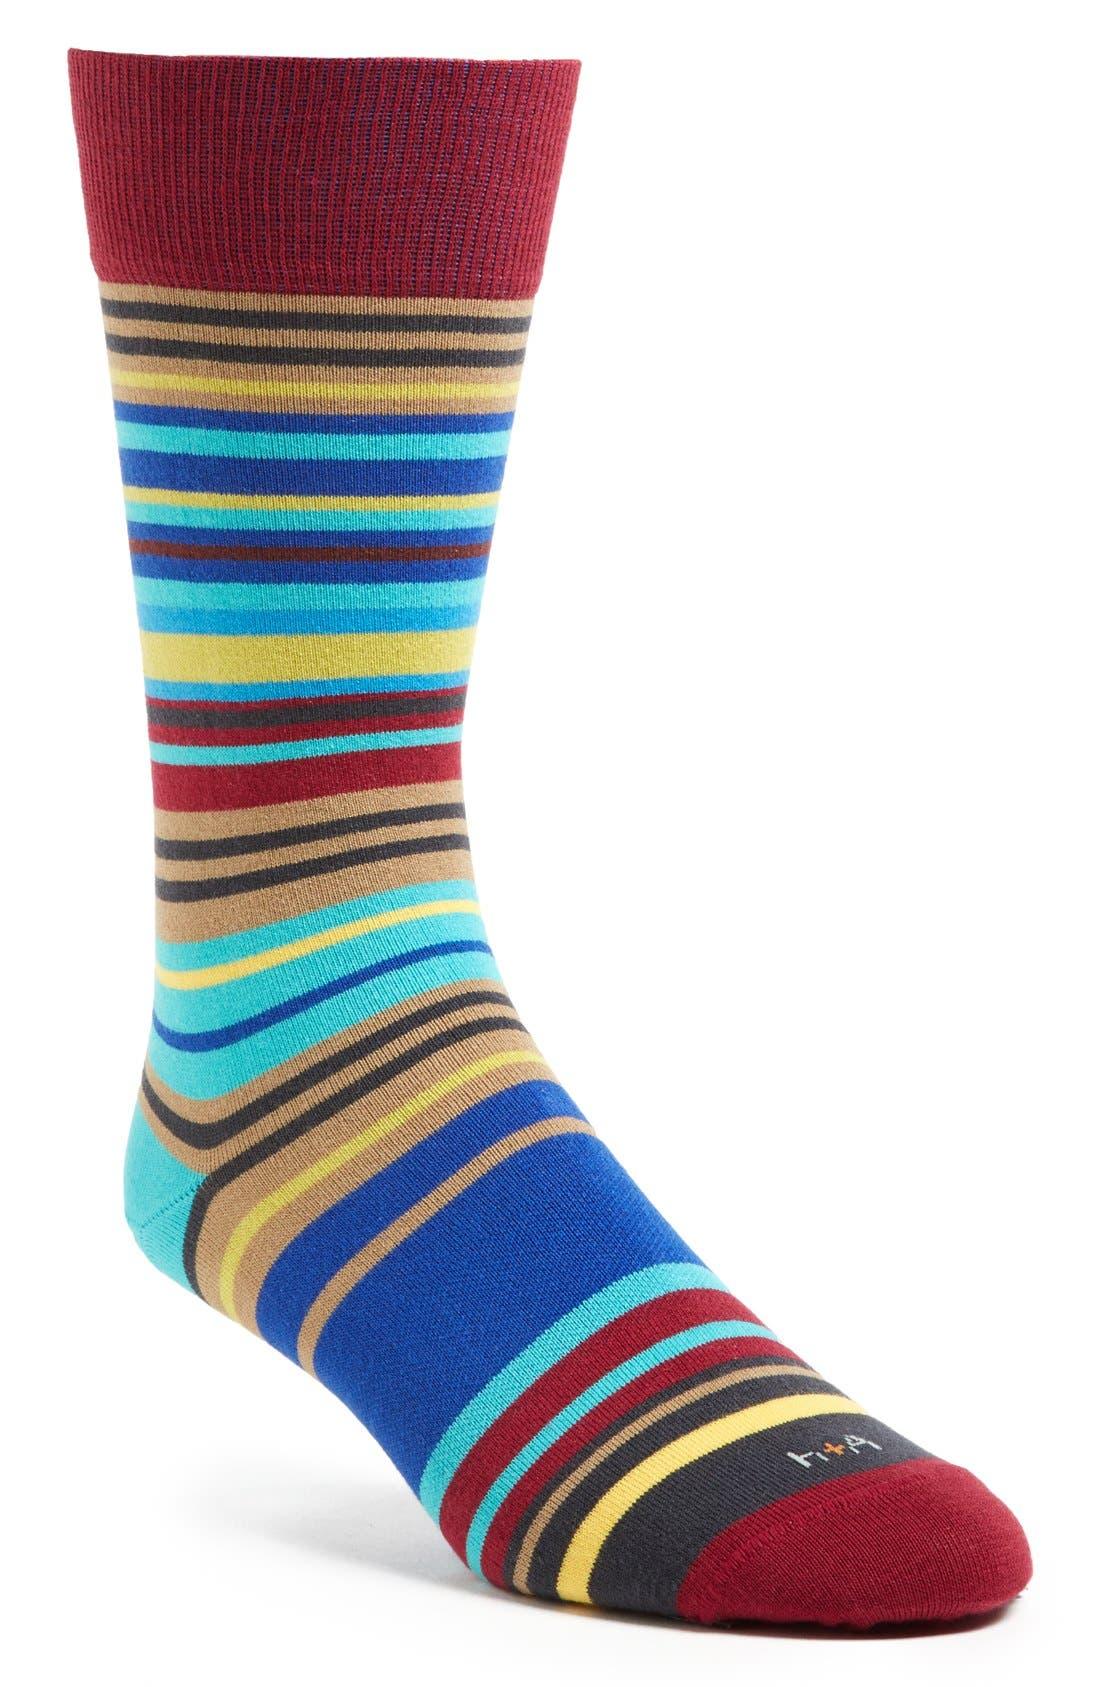 Main Image - hook + ALBERT 'Ocean Breeze' Socks